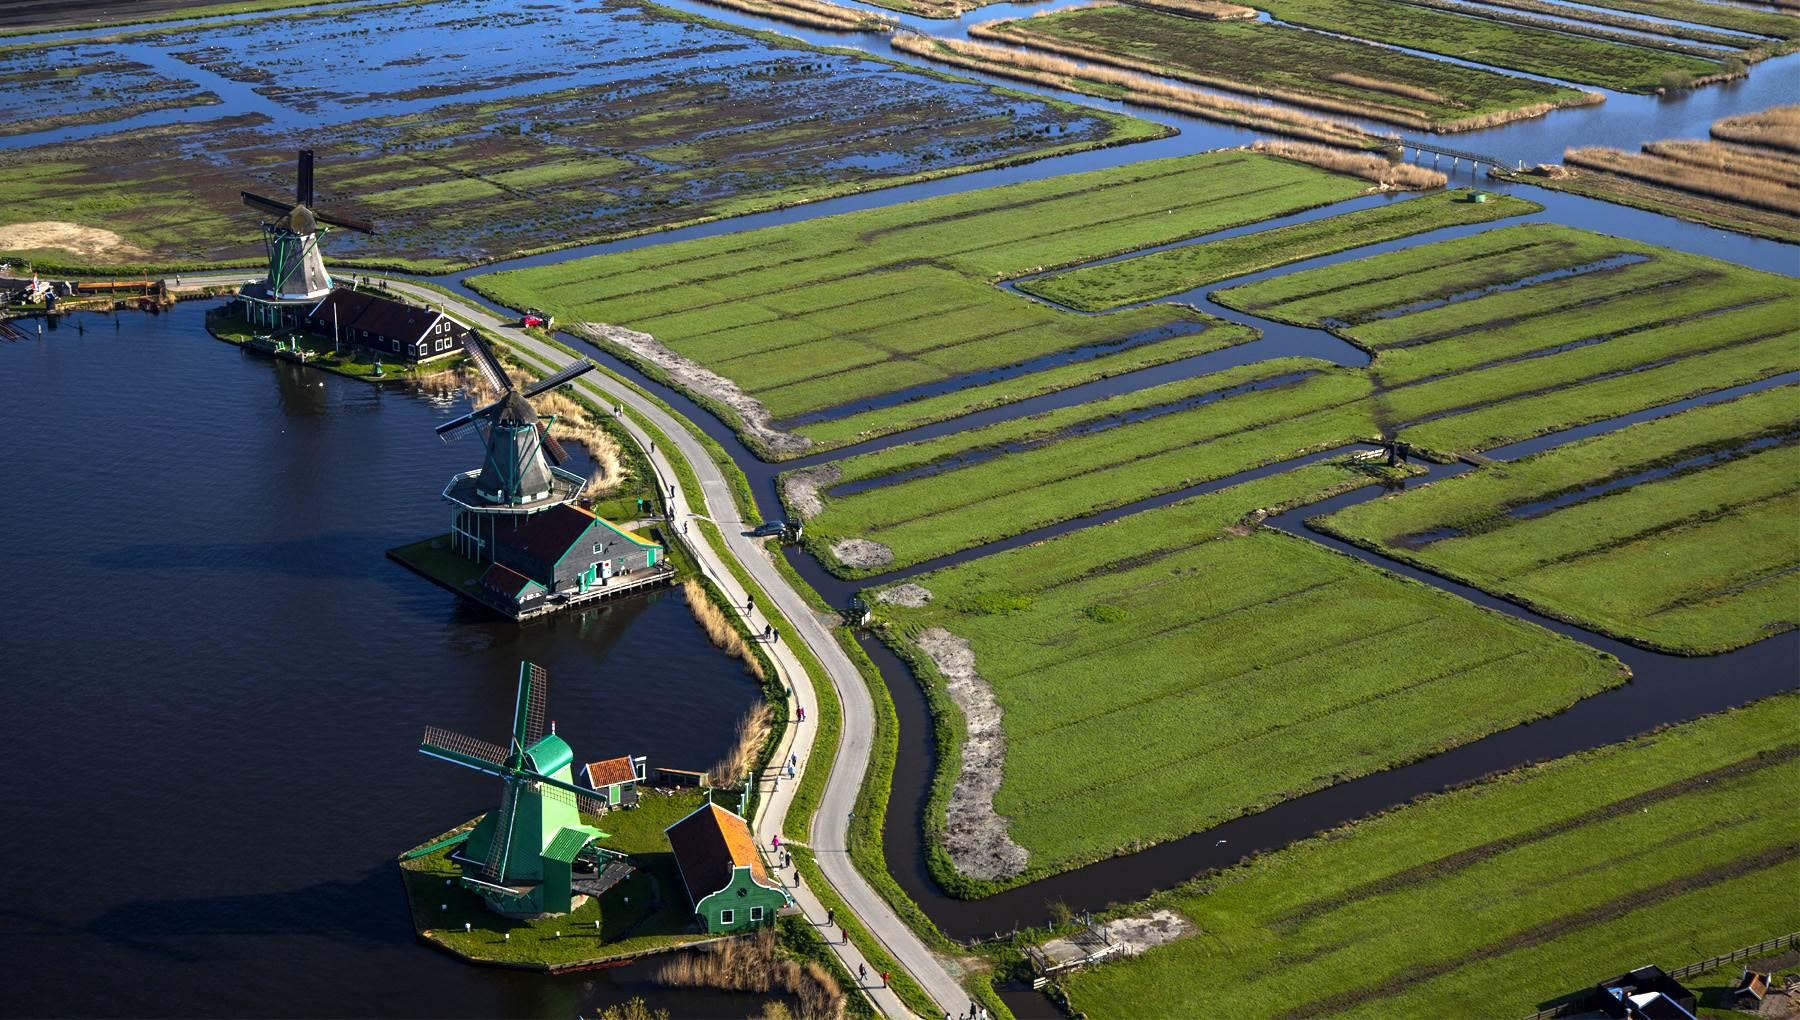 Zaanse Schans, Desa Wisata dengan Pesona Kincir Angin yang Cantik di Belanda